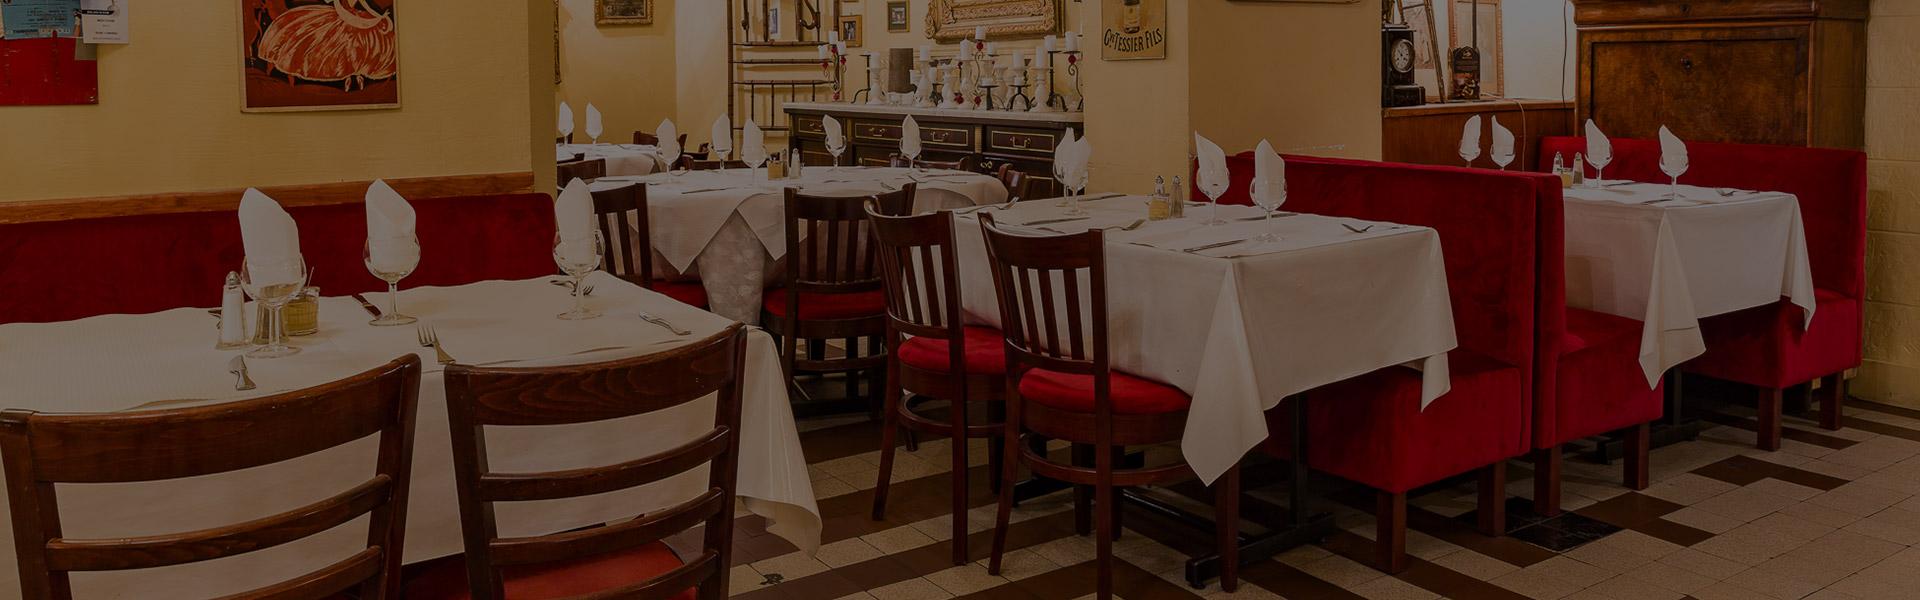 Slider-kristal-palace-salle-restaurant